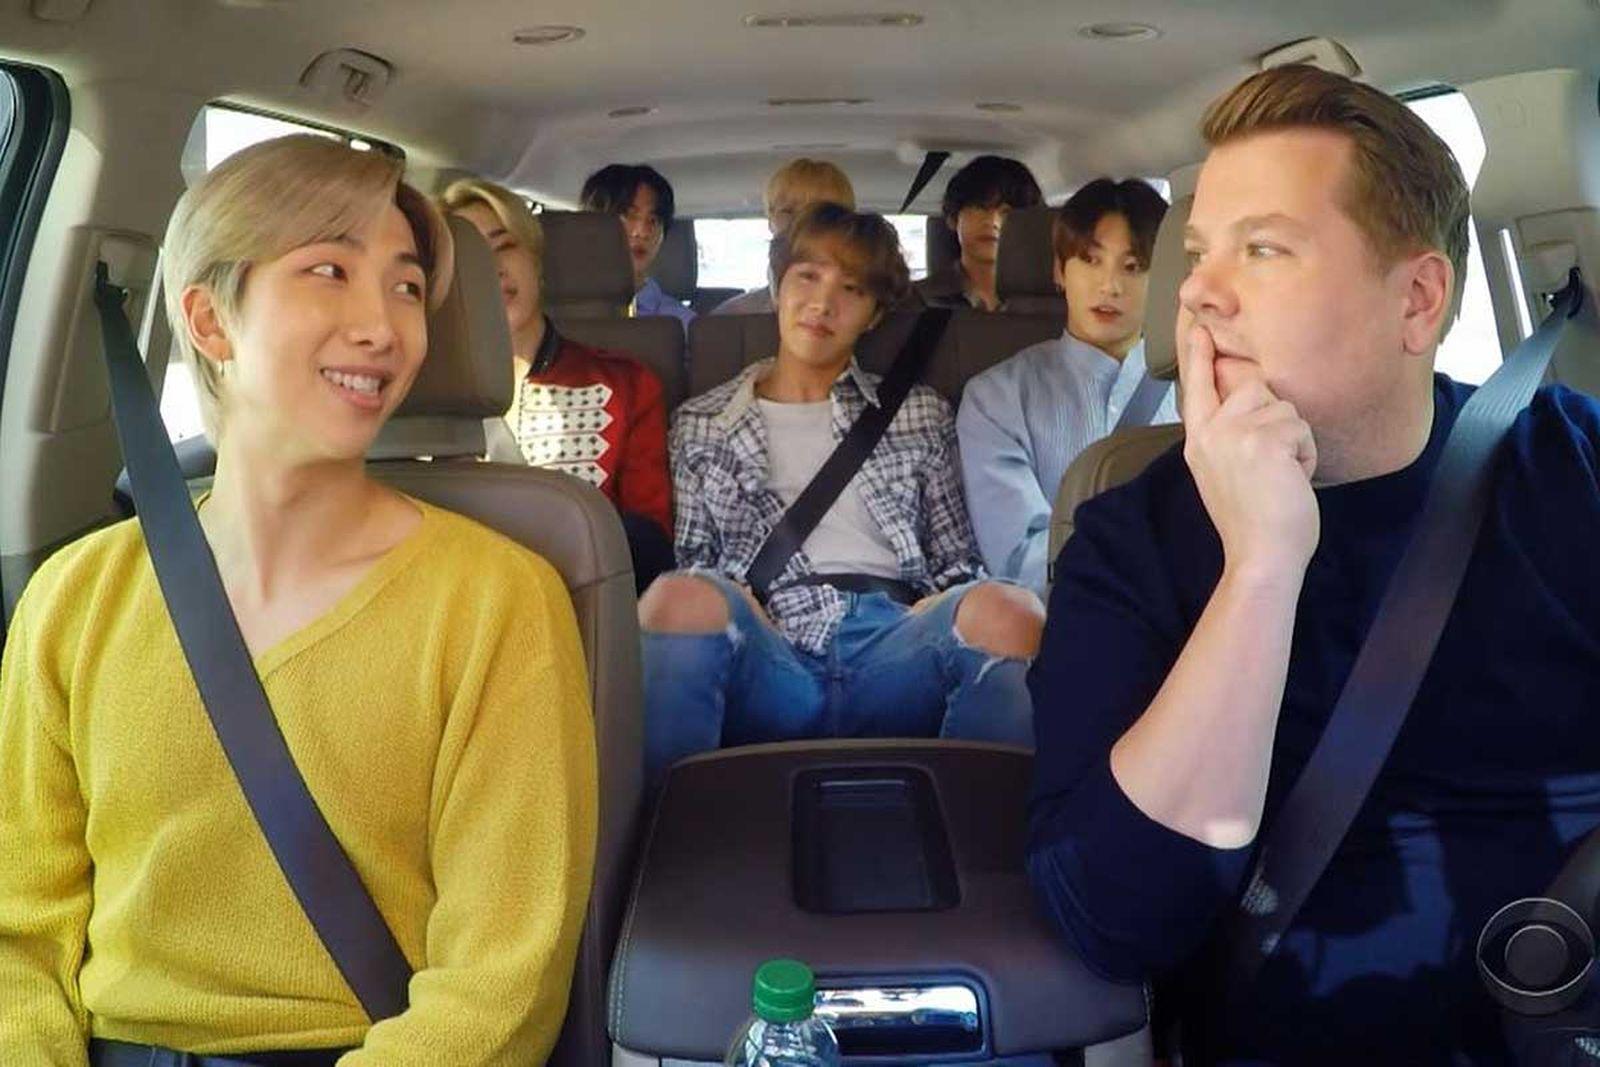 BTS on Carpool Karaoke with James Corden